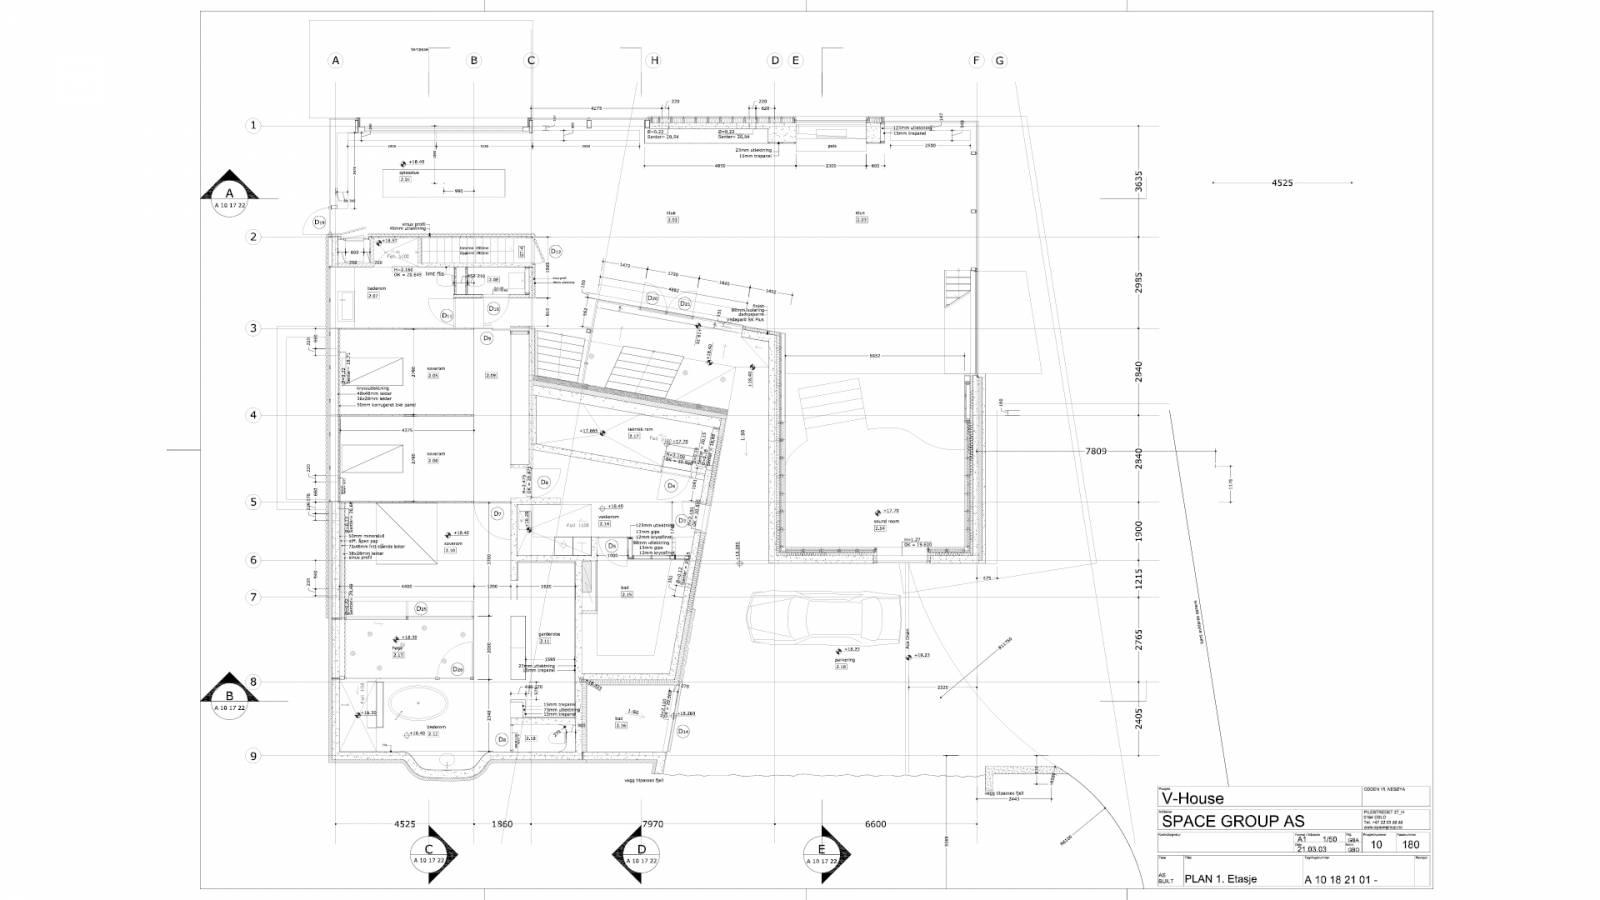 LOWER LEVEL PLAN - V-House - SPOL Architects